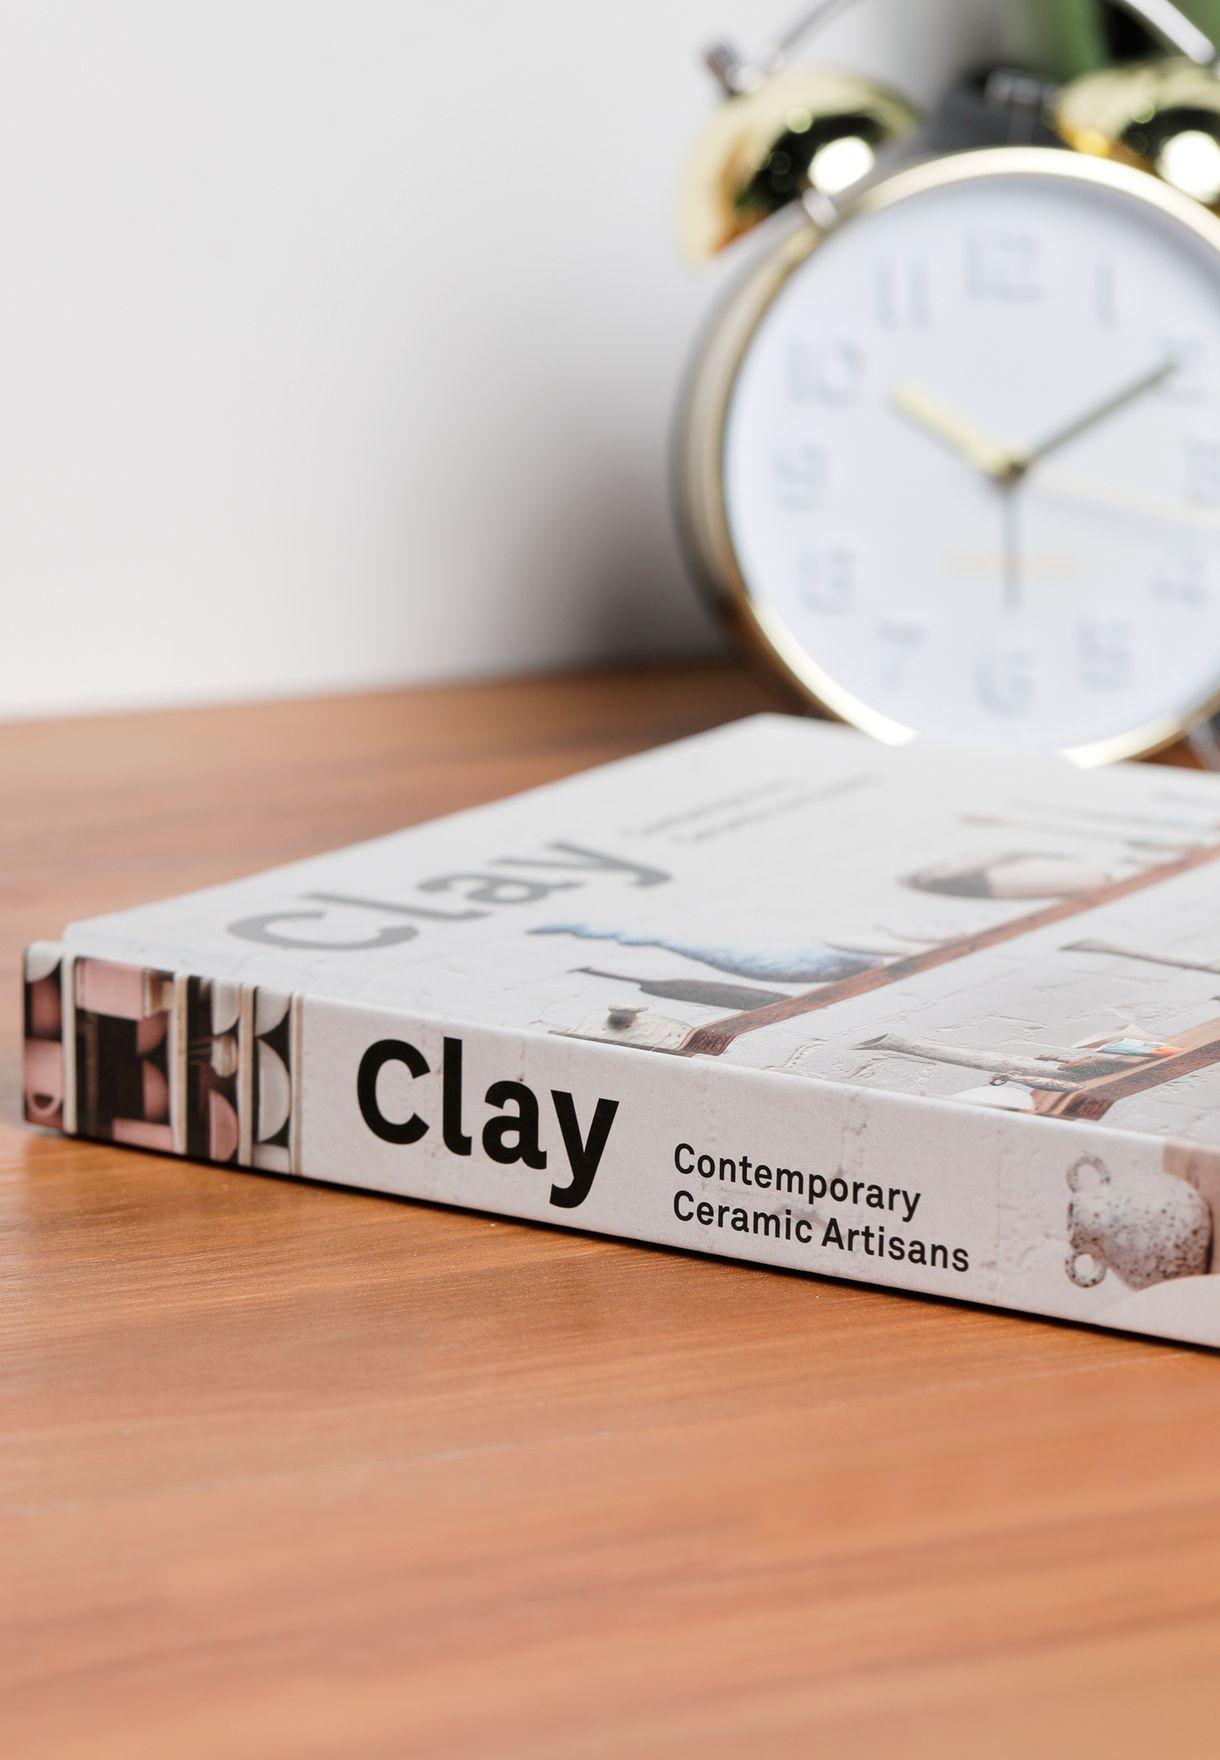 كتاب كلاي: كونتيمبوراري سيراميك ارتيشنز